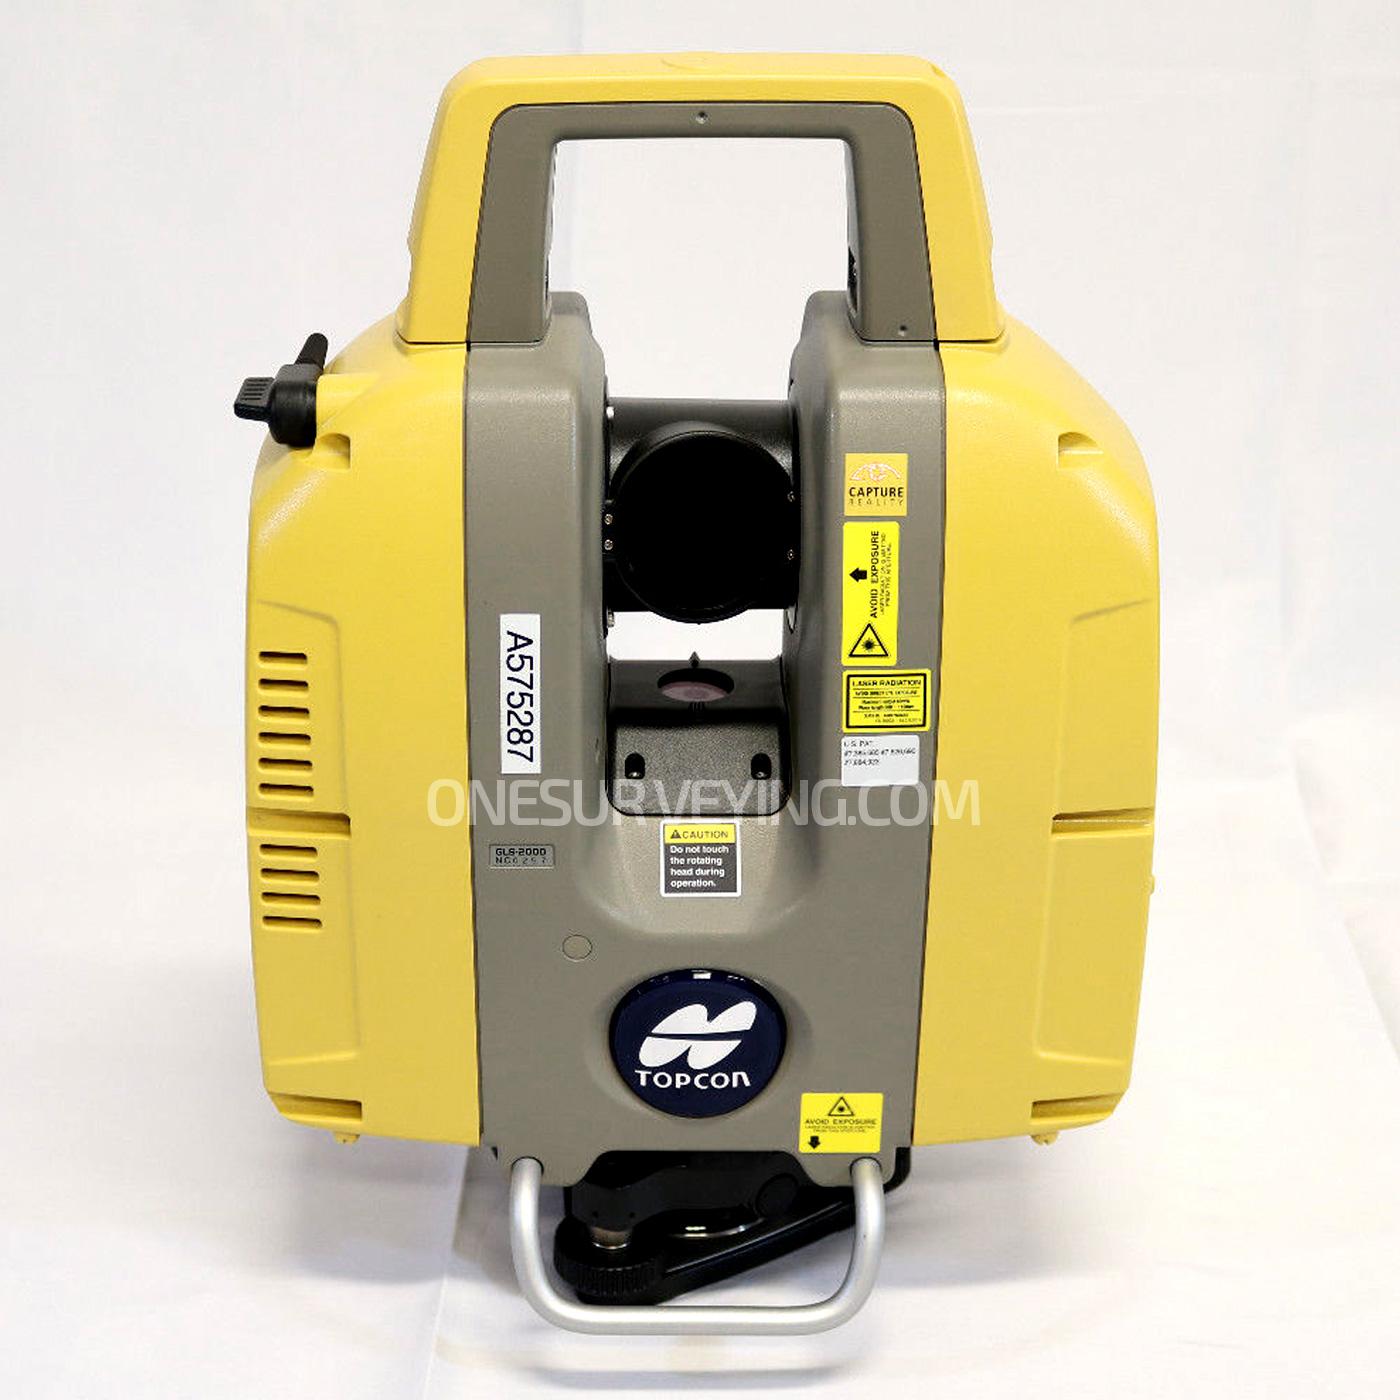 Used-Topcon-GLS-2000S-3D-Laser-Scanner.jpg